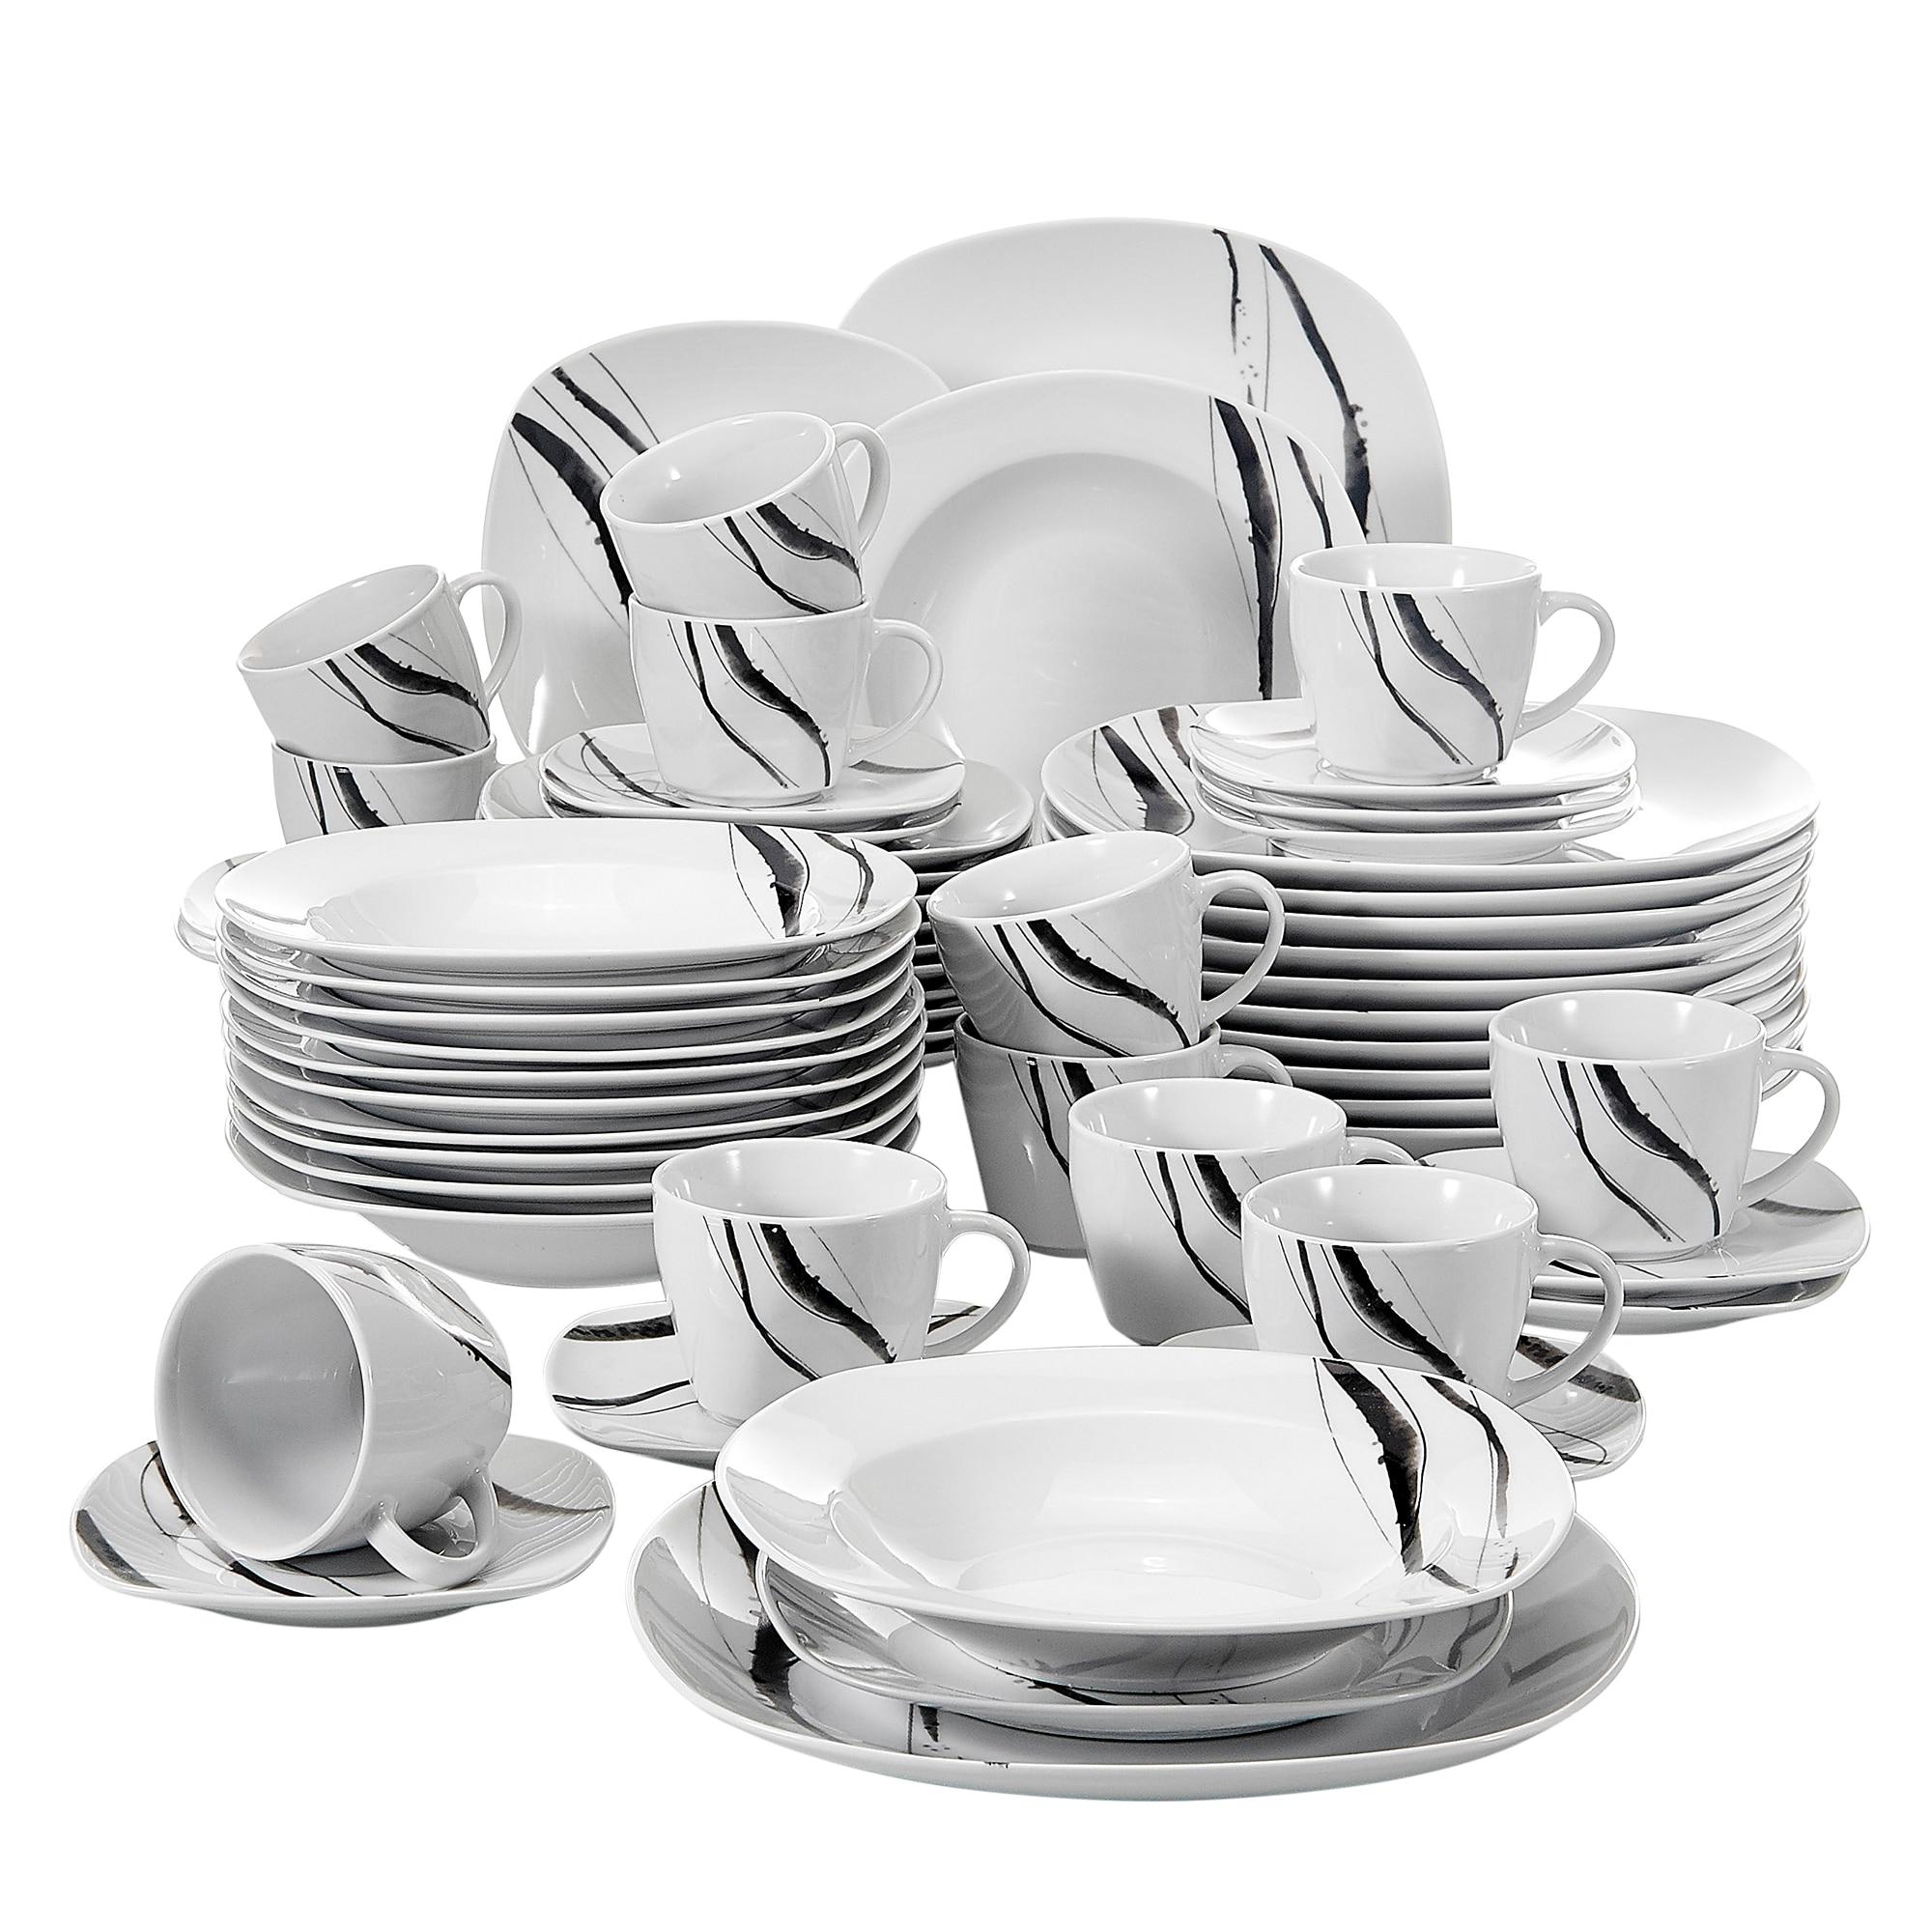 Juego de cena de porcelana China de 60 piezas de VEWEET Theresa con tazas, platos para postres, platos para sopa, juego de platos para cenar